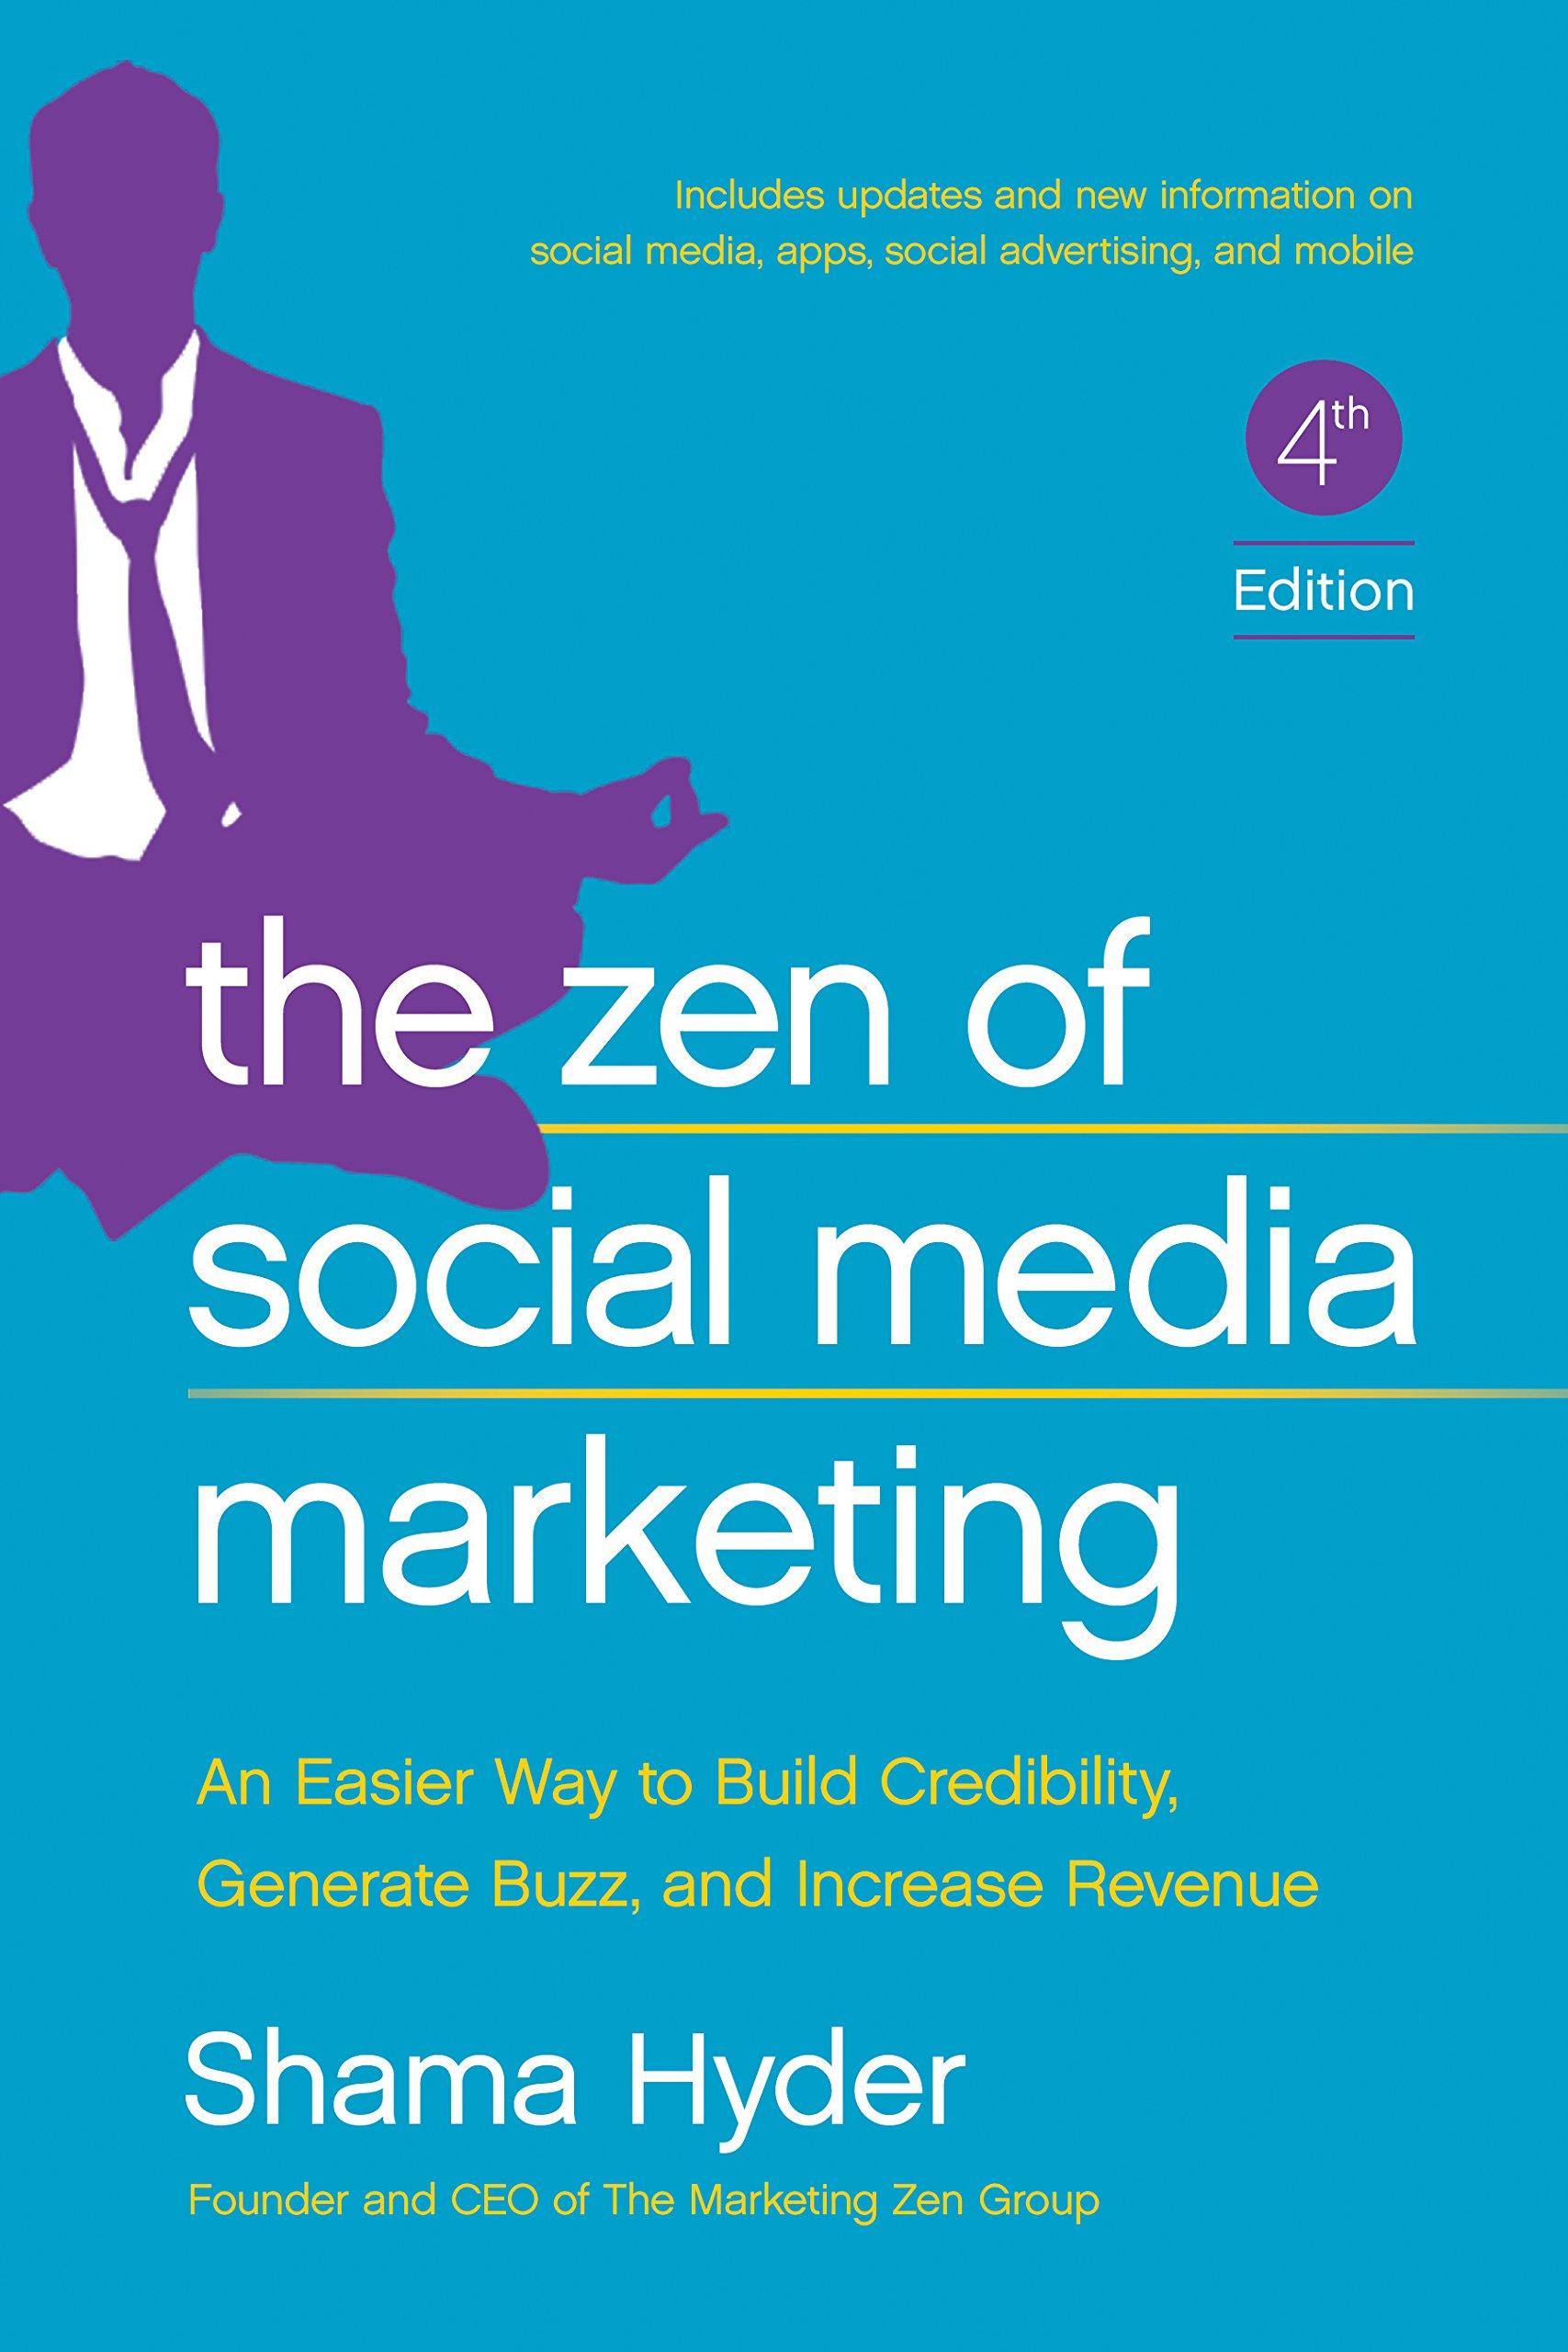 The Zen of Social Media Marketing: An Easier Way to Build Credibility, Generate Buzz, and Increase Revenue: Amazon.es: Shama Hyder: Libros en idiomas ...